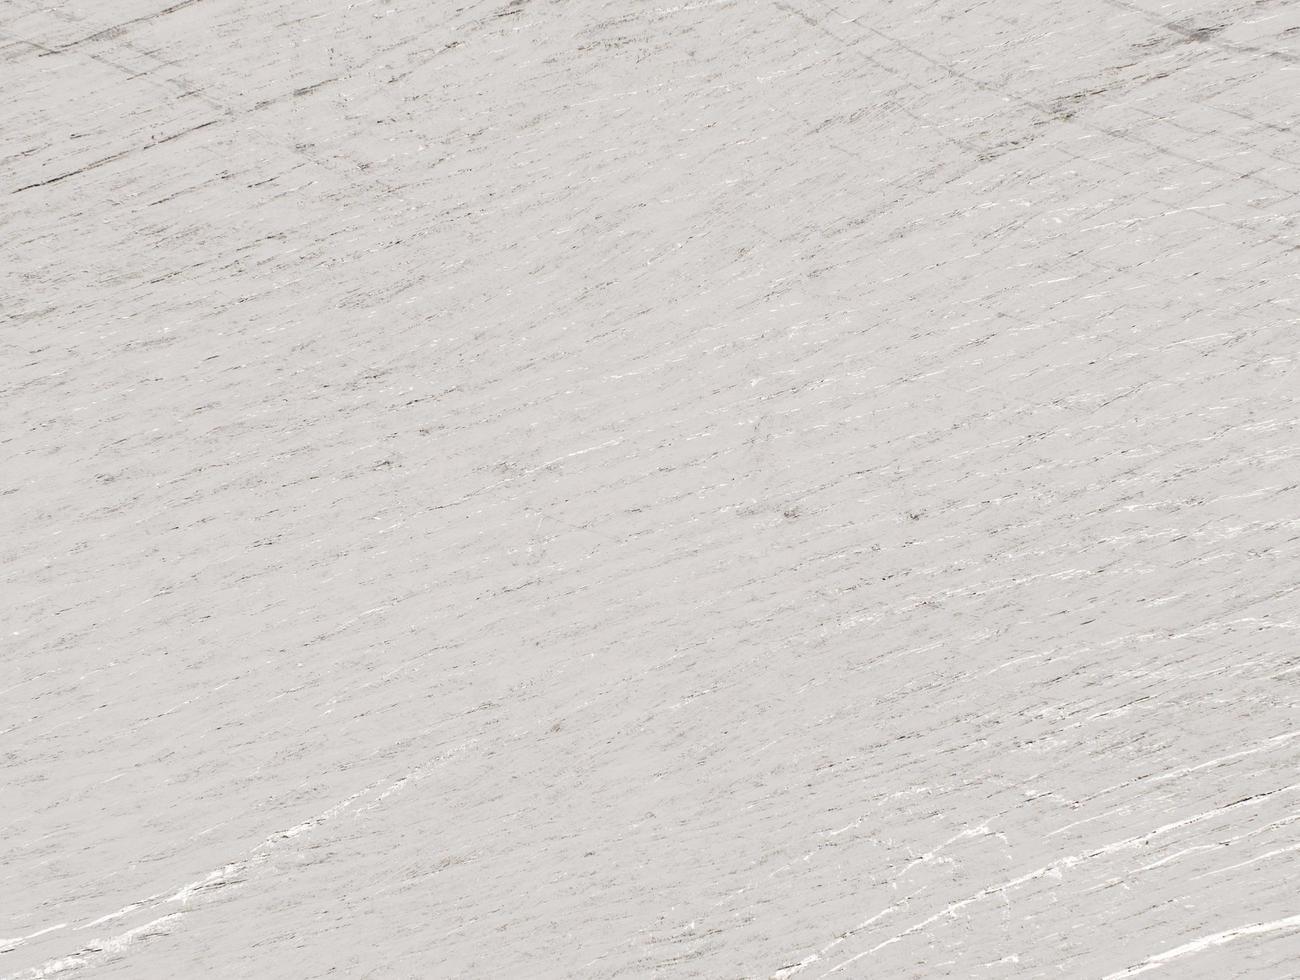 textura de grano de madera foto